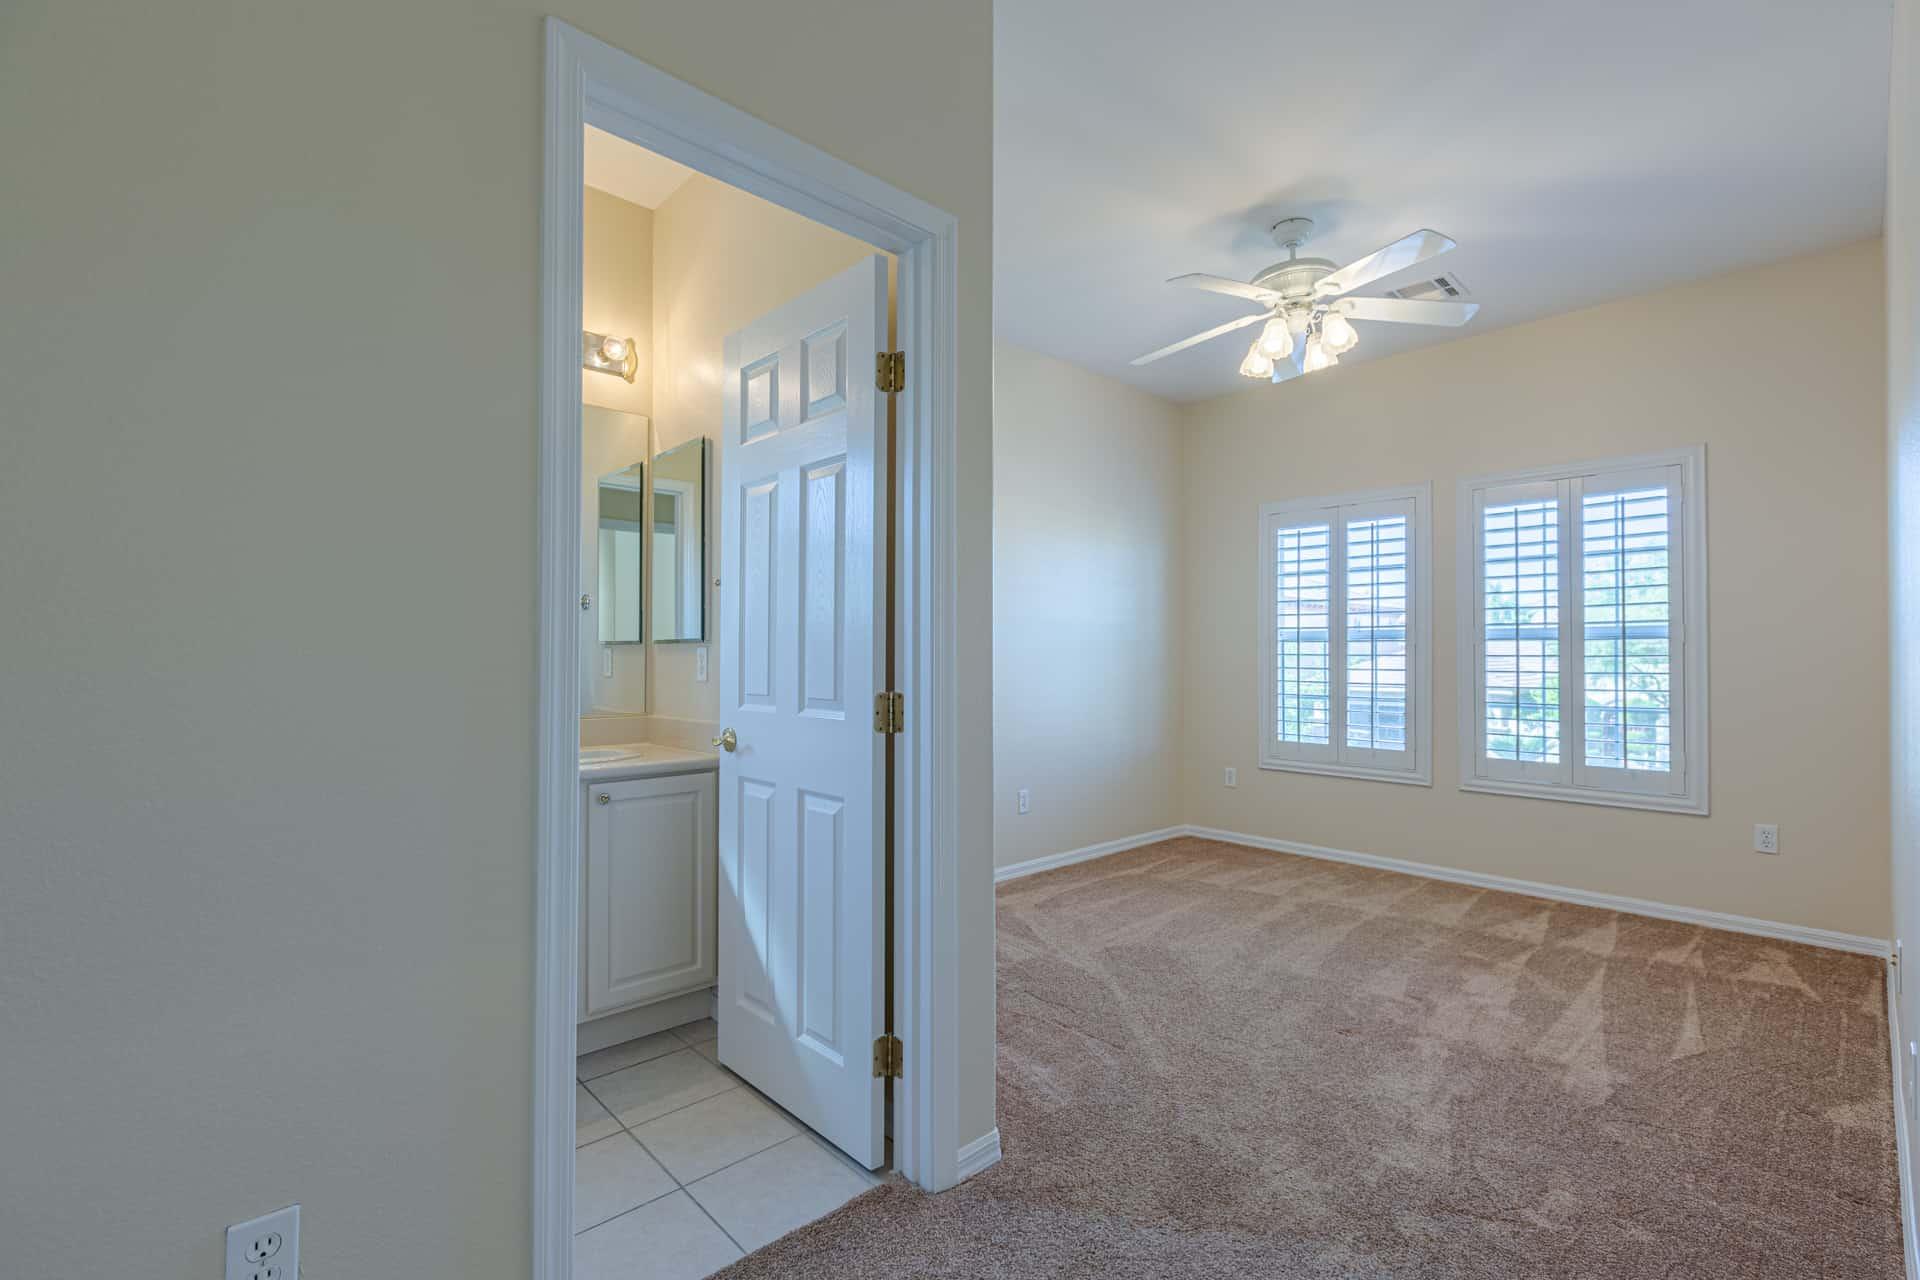 las-vegas-luxry-real-estate-realtor-rob-jensen-company-10729-grey-havens-court-willow-creek4757